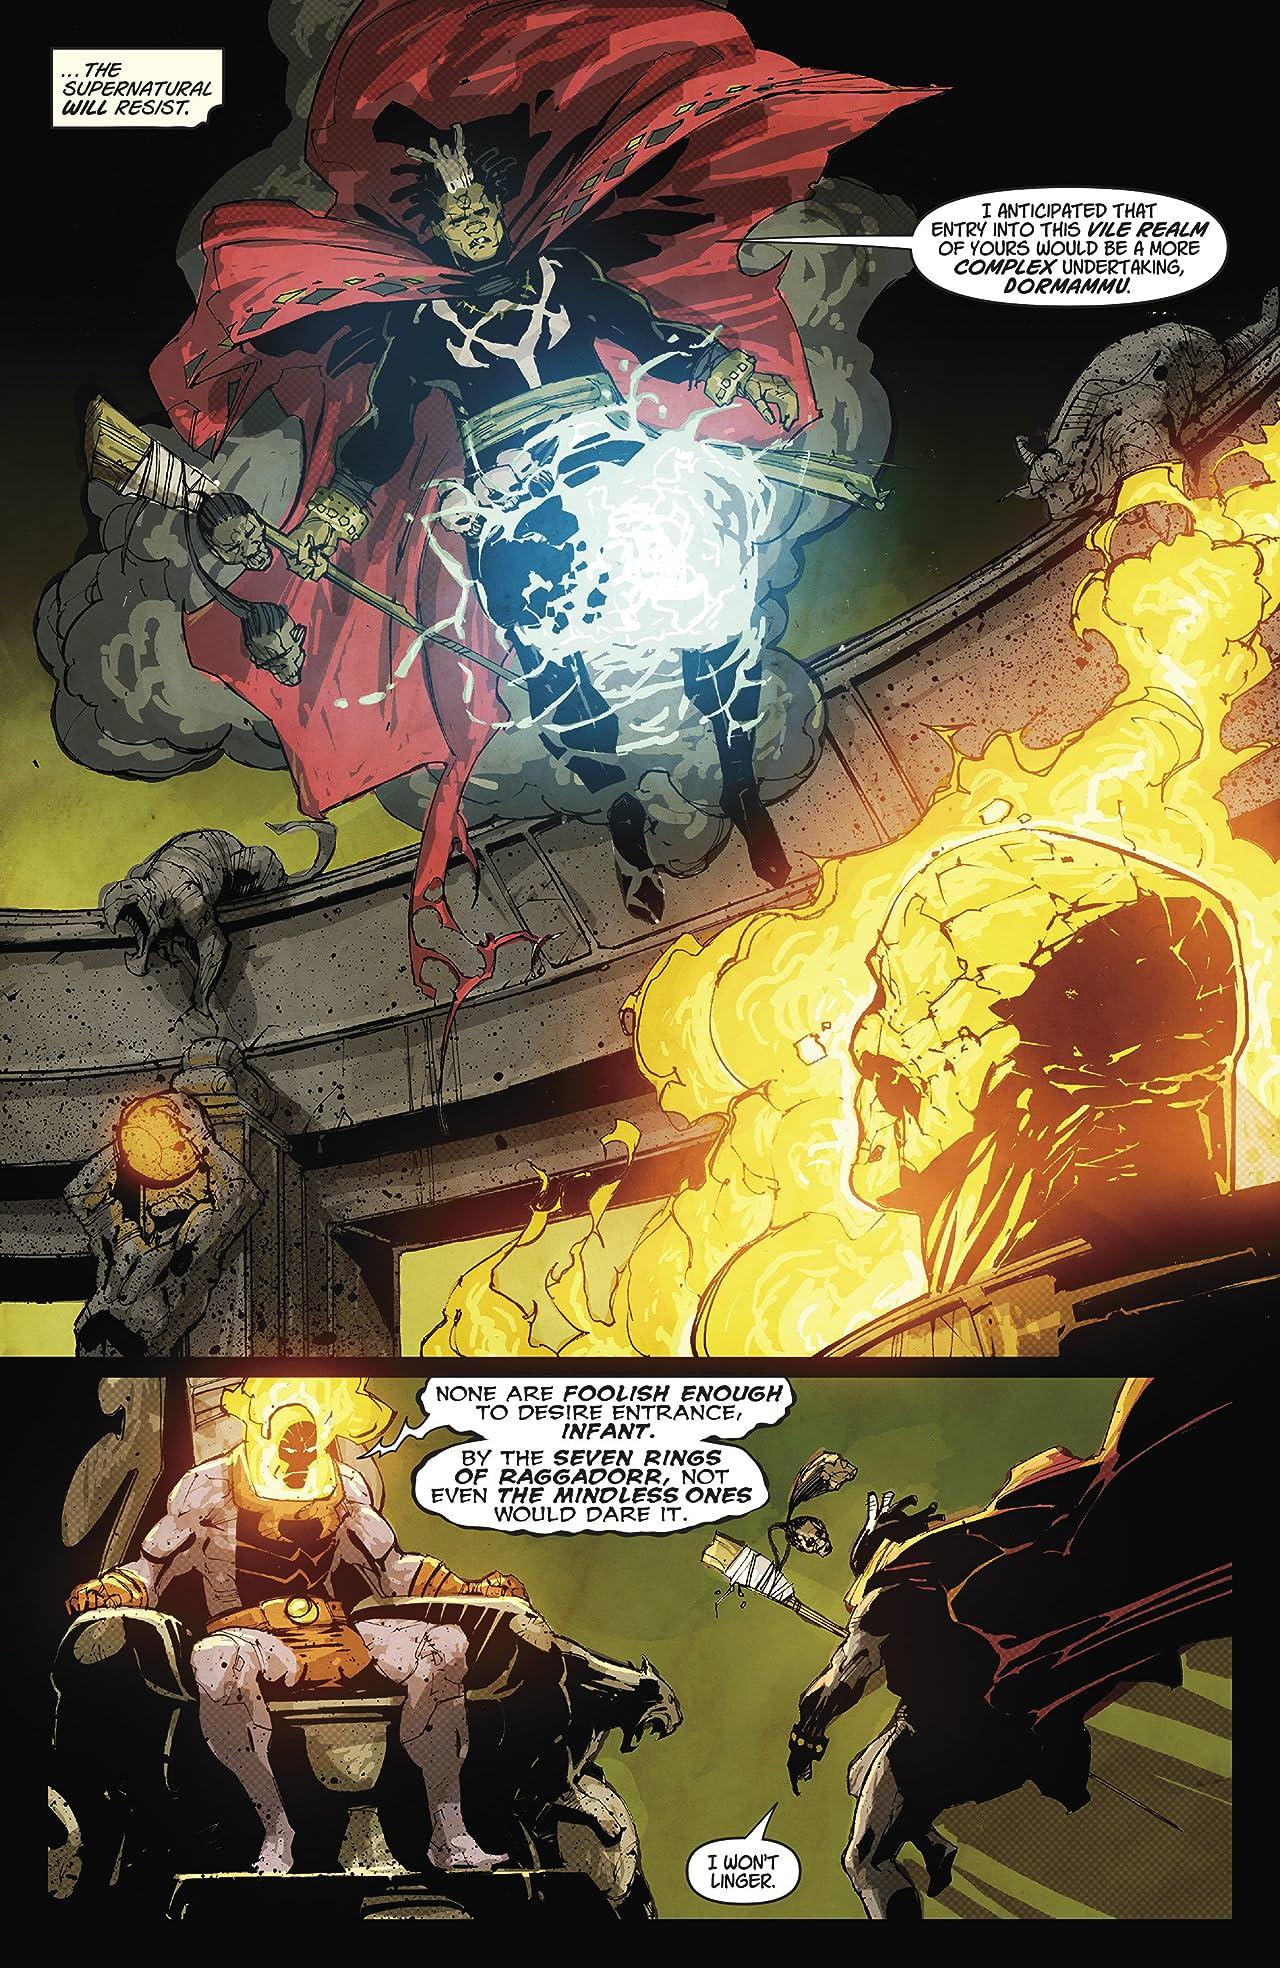 Doctor Voodoo: Avenger of the Supernatural